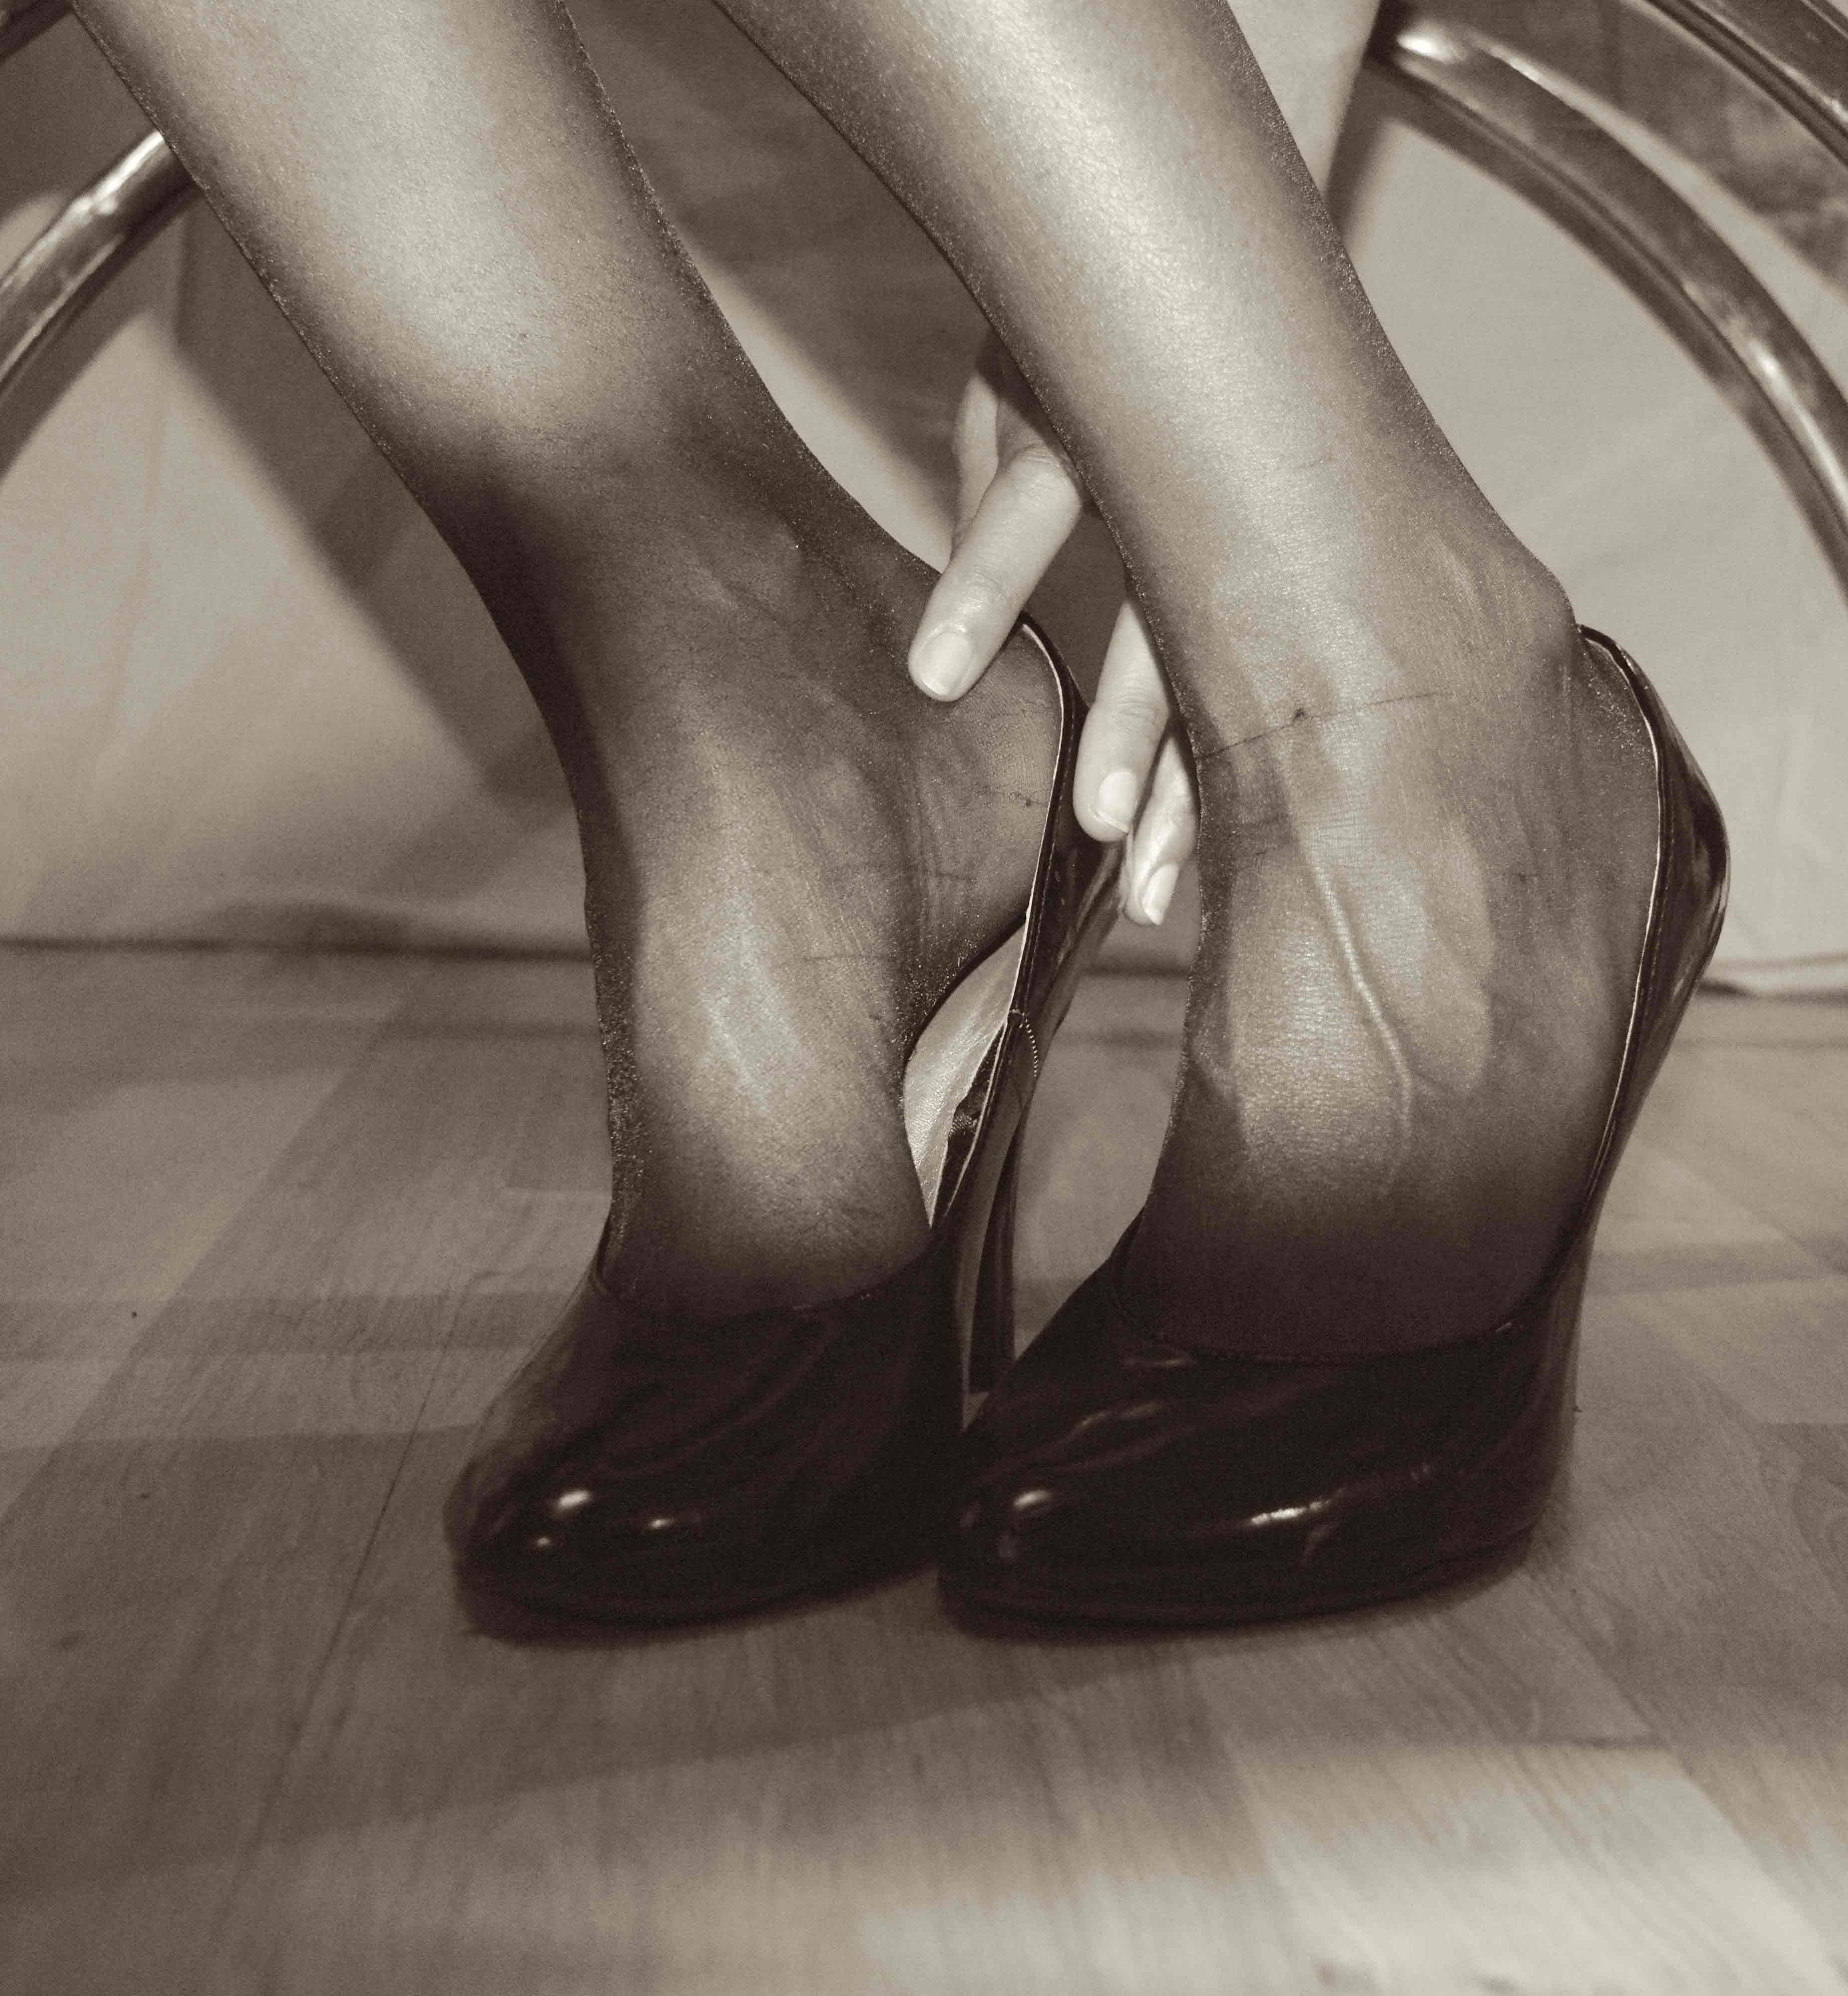 london-spanking-punishment-humiliation-mistress-kings-cross-naughty-school-boy-caning-dominatrix